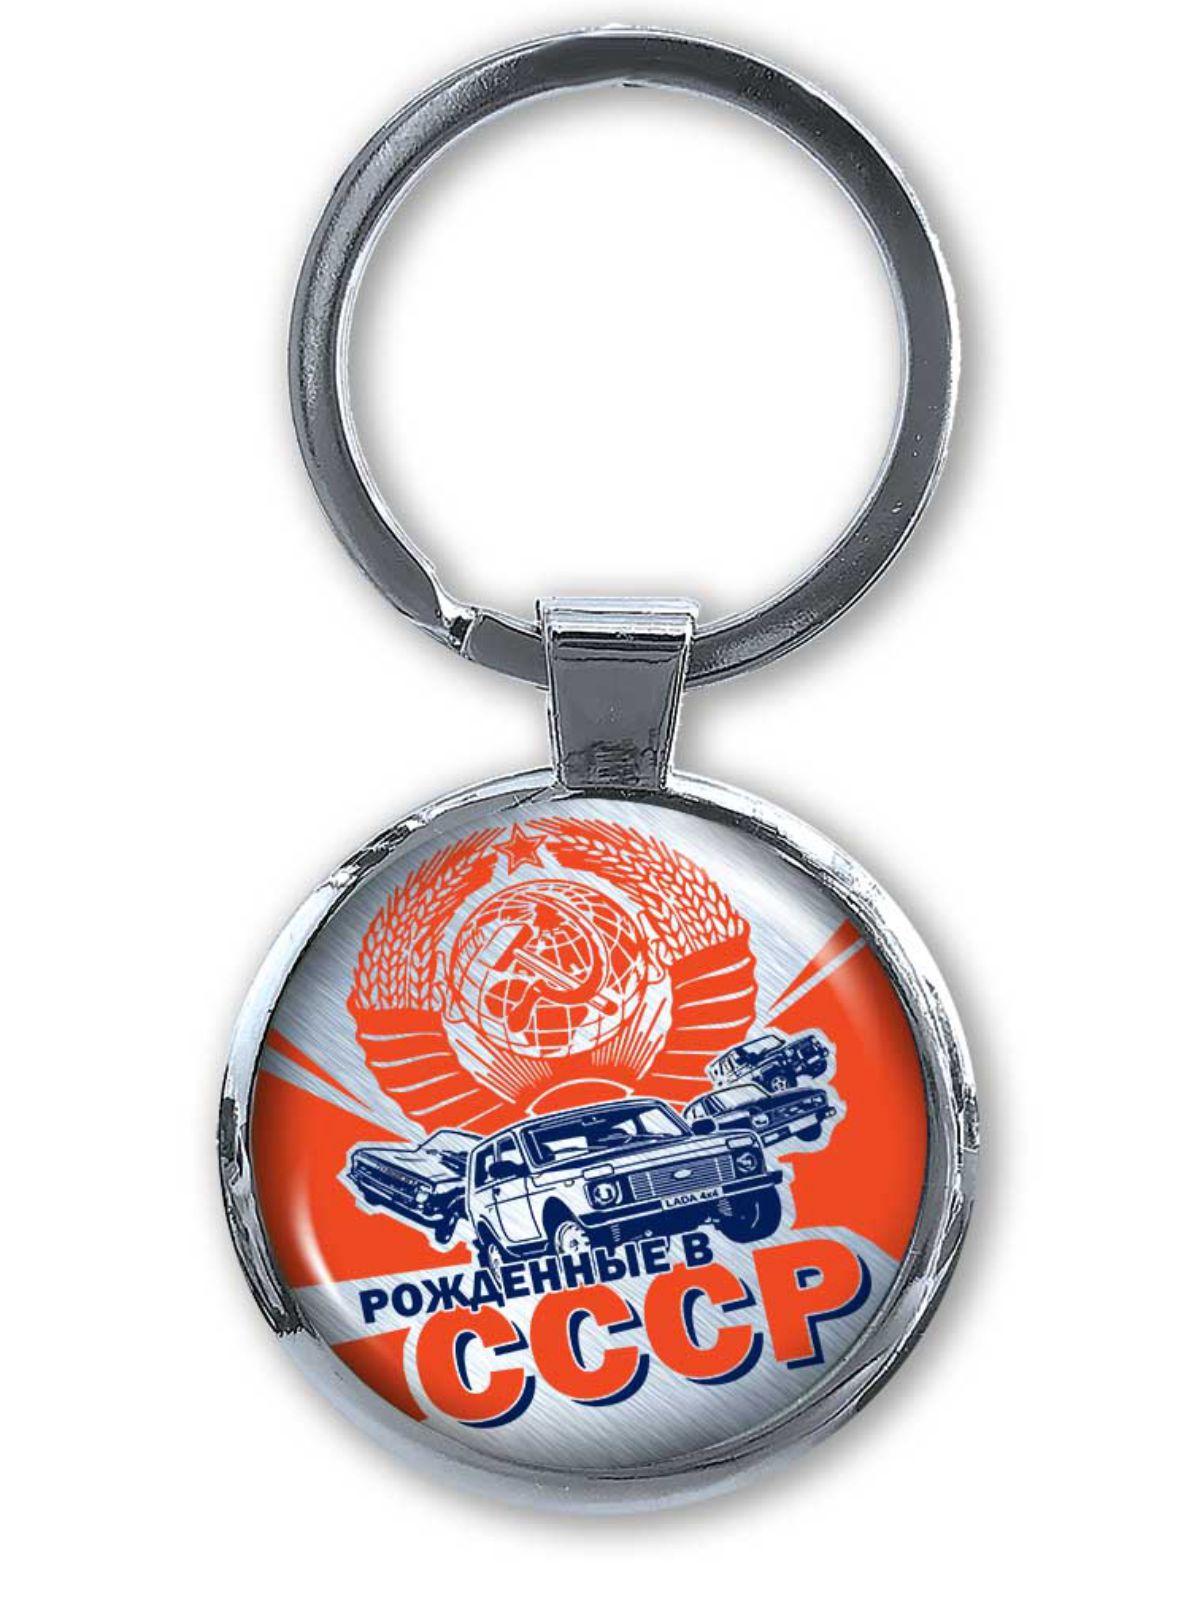 Яркий двухсторонний брелок для Рождённых в СССР от Военпро